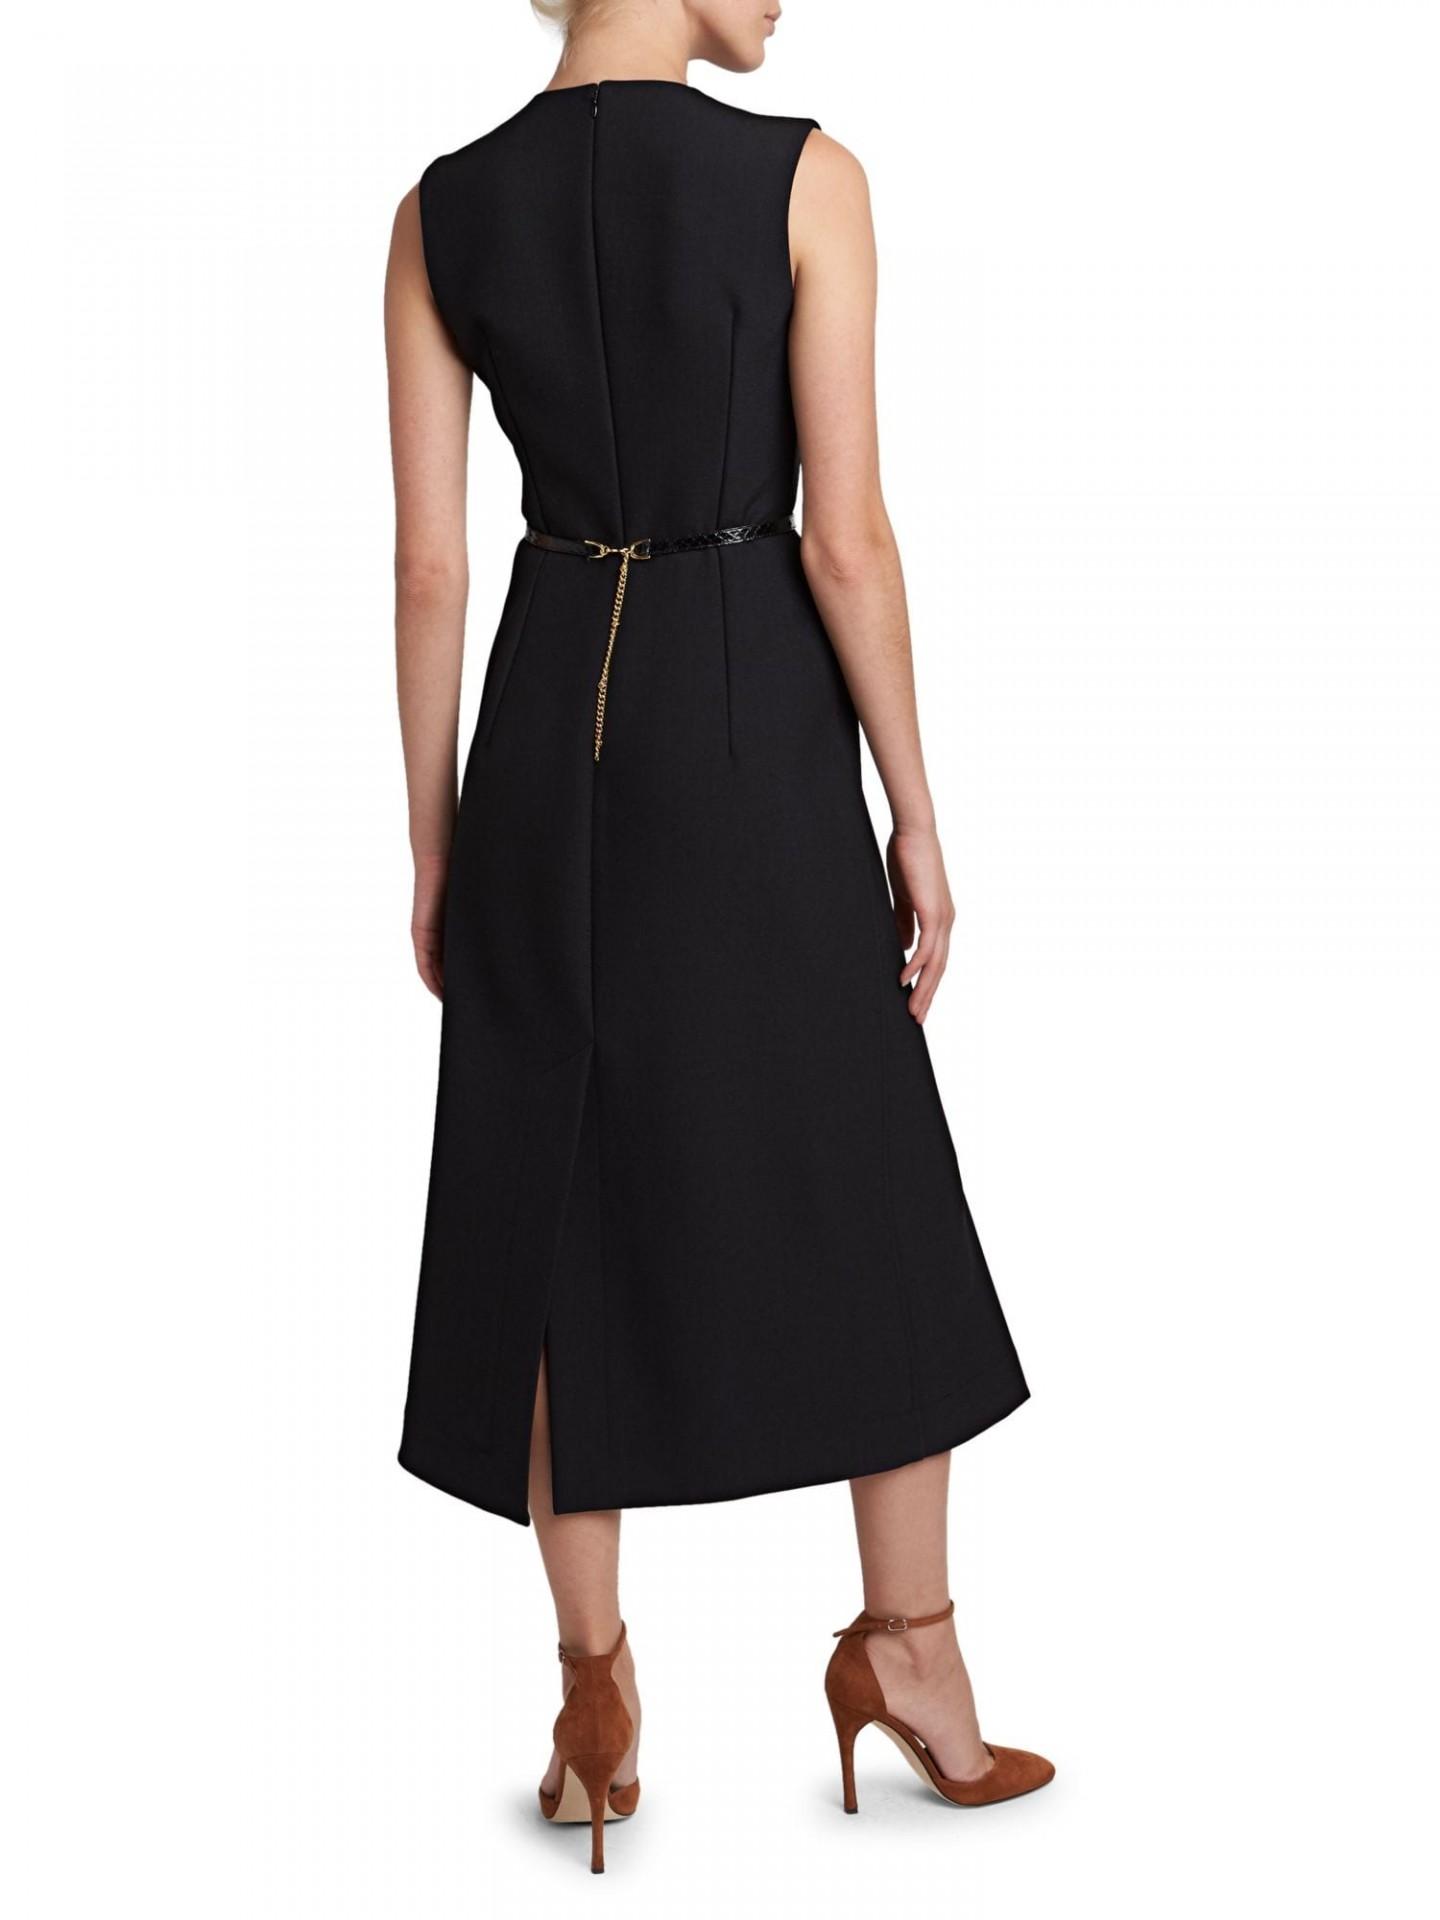 VICTORIA BECKHAM Belted Midi Dress